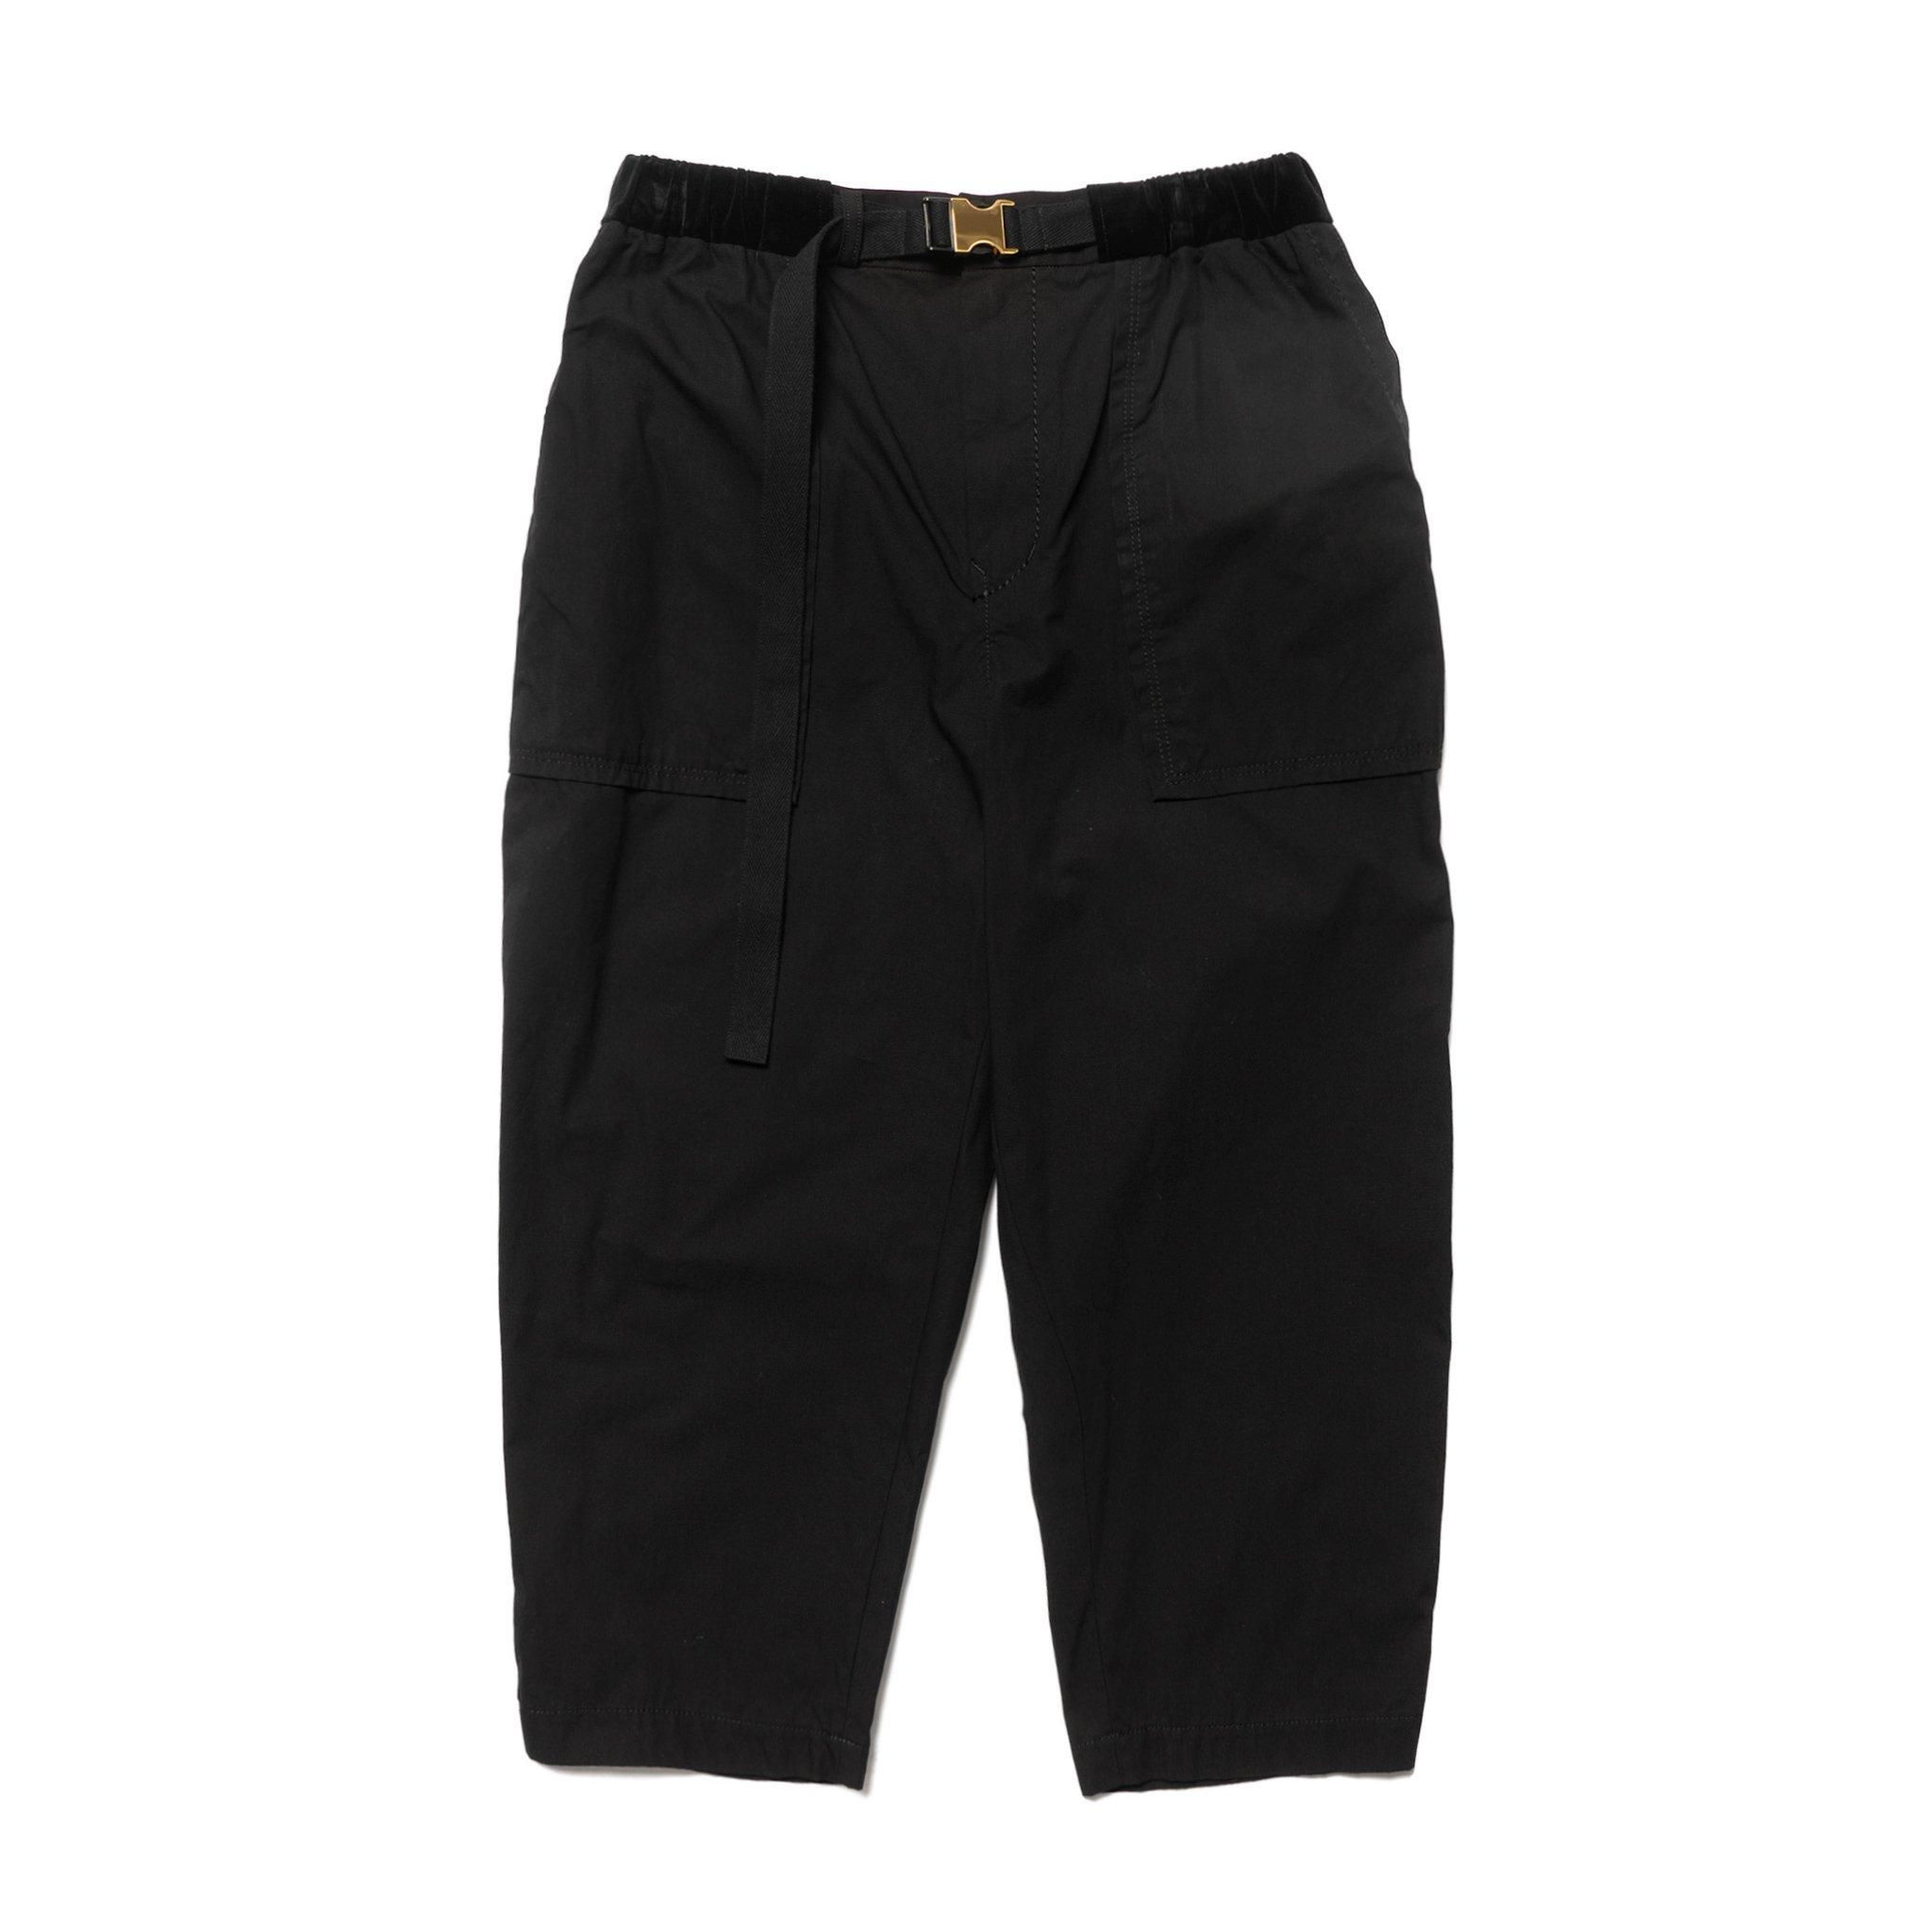 HAVEN-Sacai-Cotton-Nylon-Oxford-Pants-Black-1_2048x2048.progressive.jpg